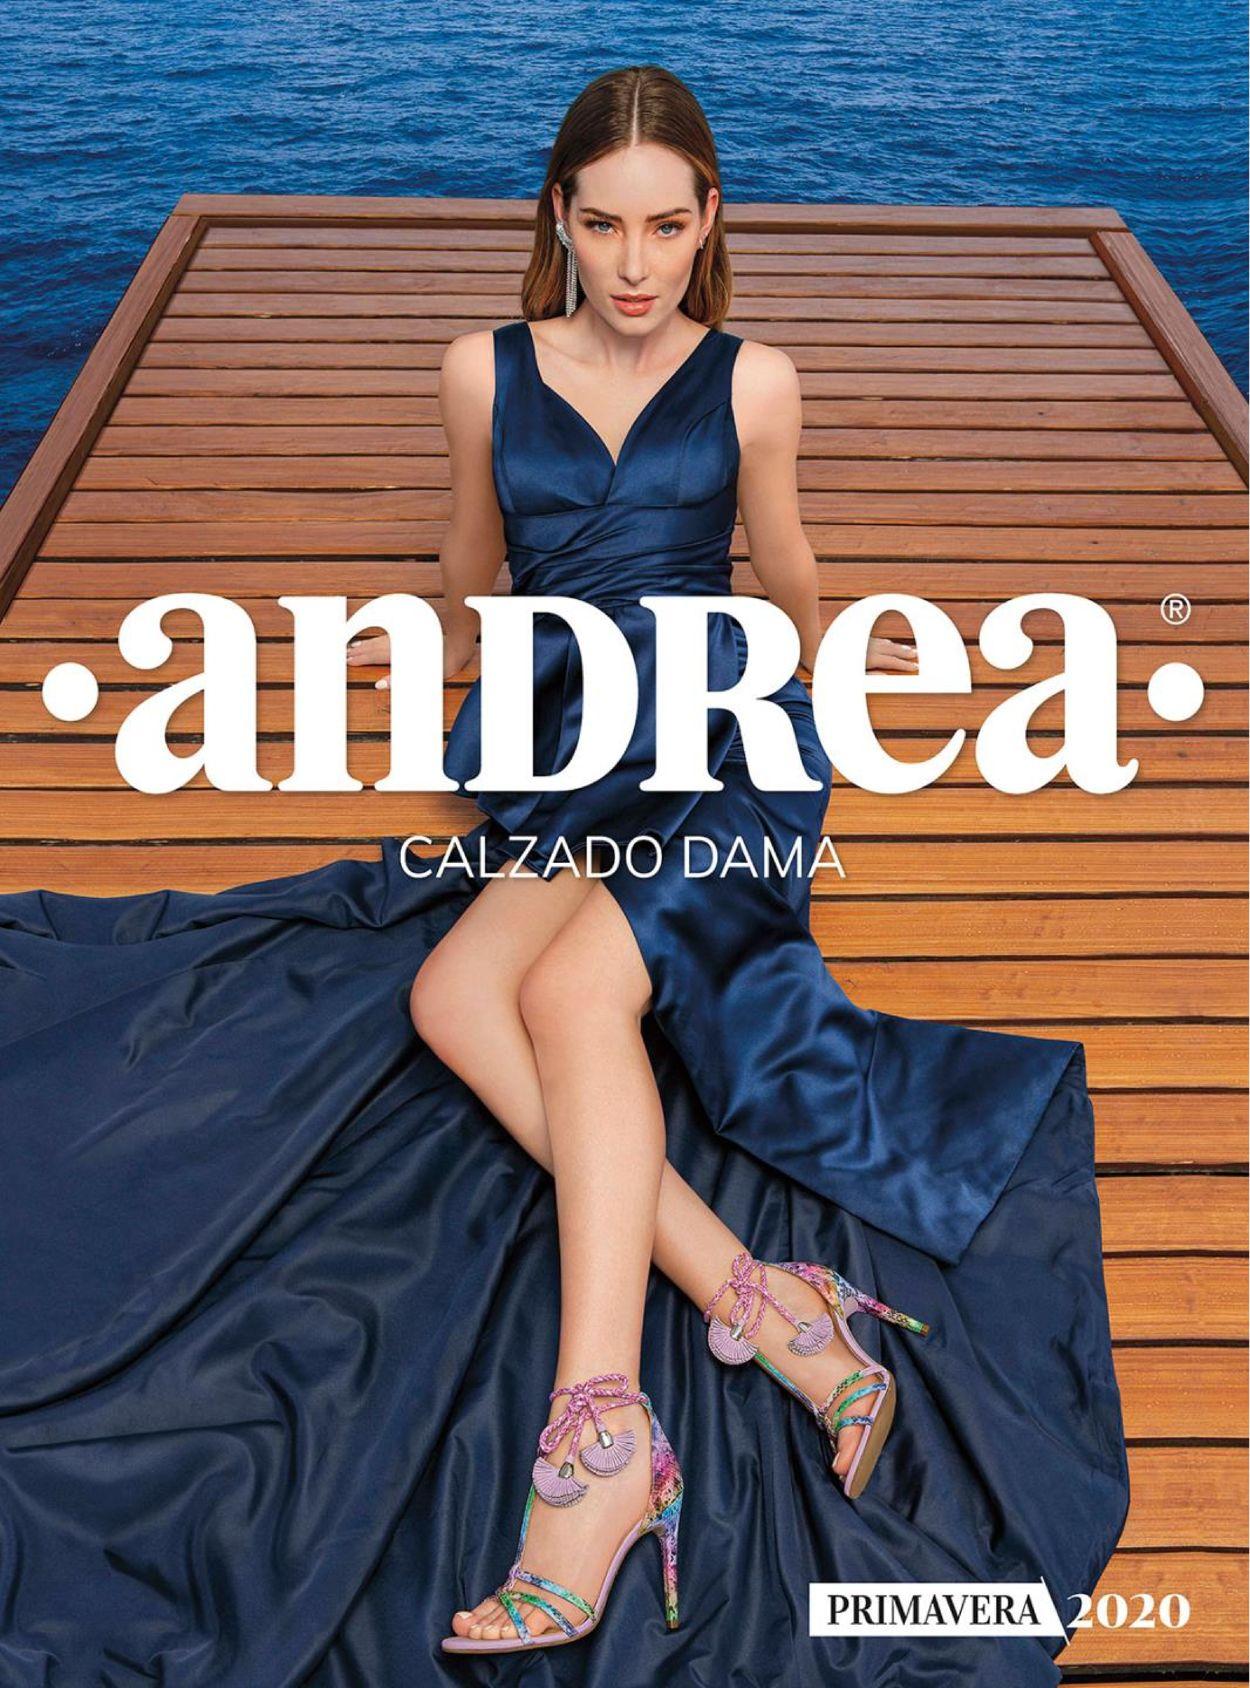 Andrea Folleto - 14.04-31.05.2020